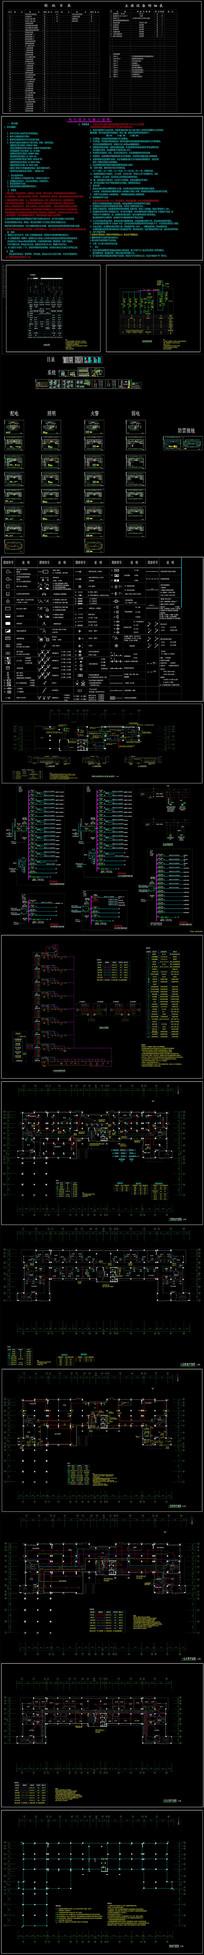 CAD知名行政办公楼全套电气施工图